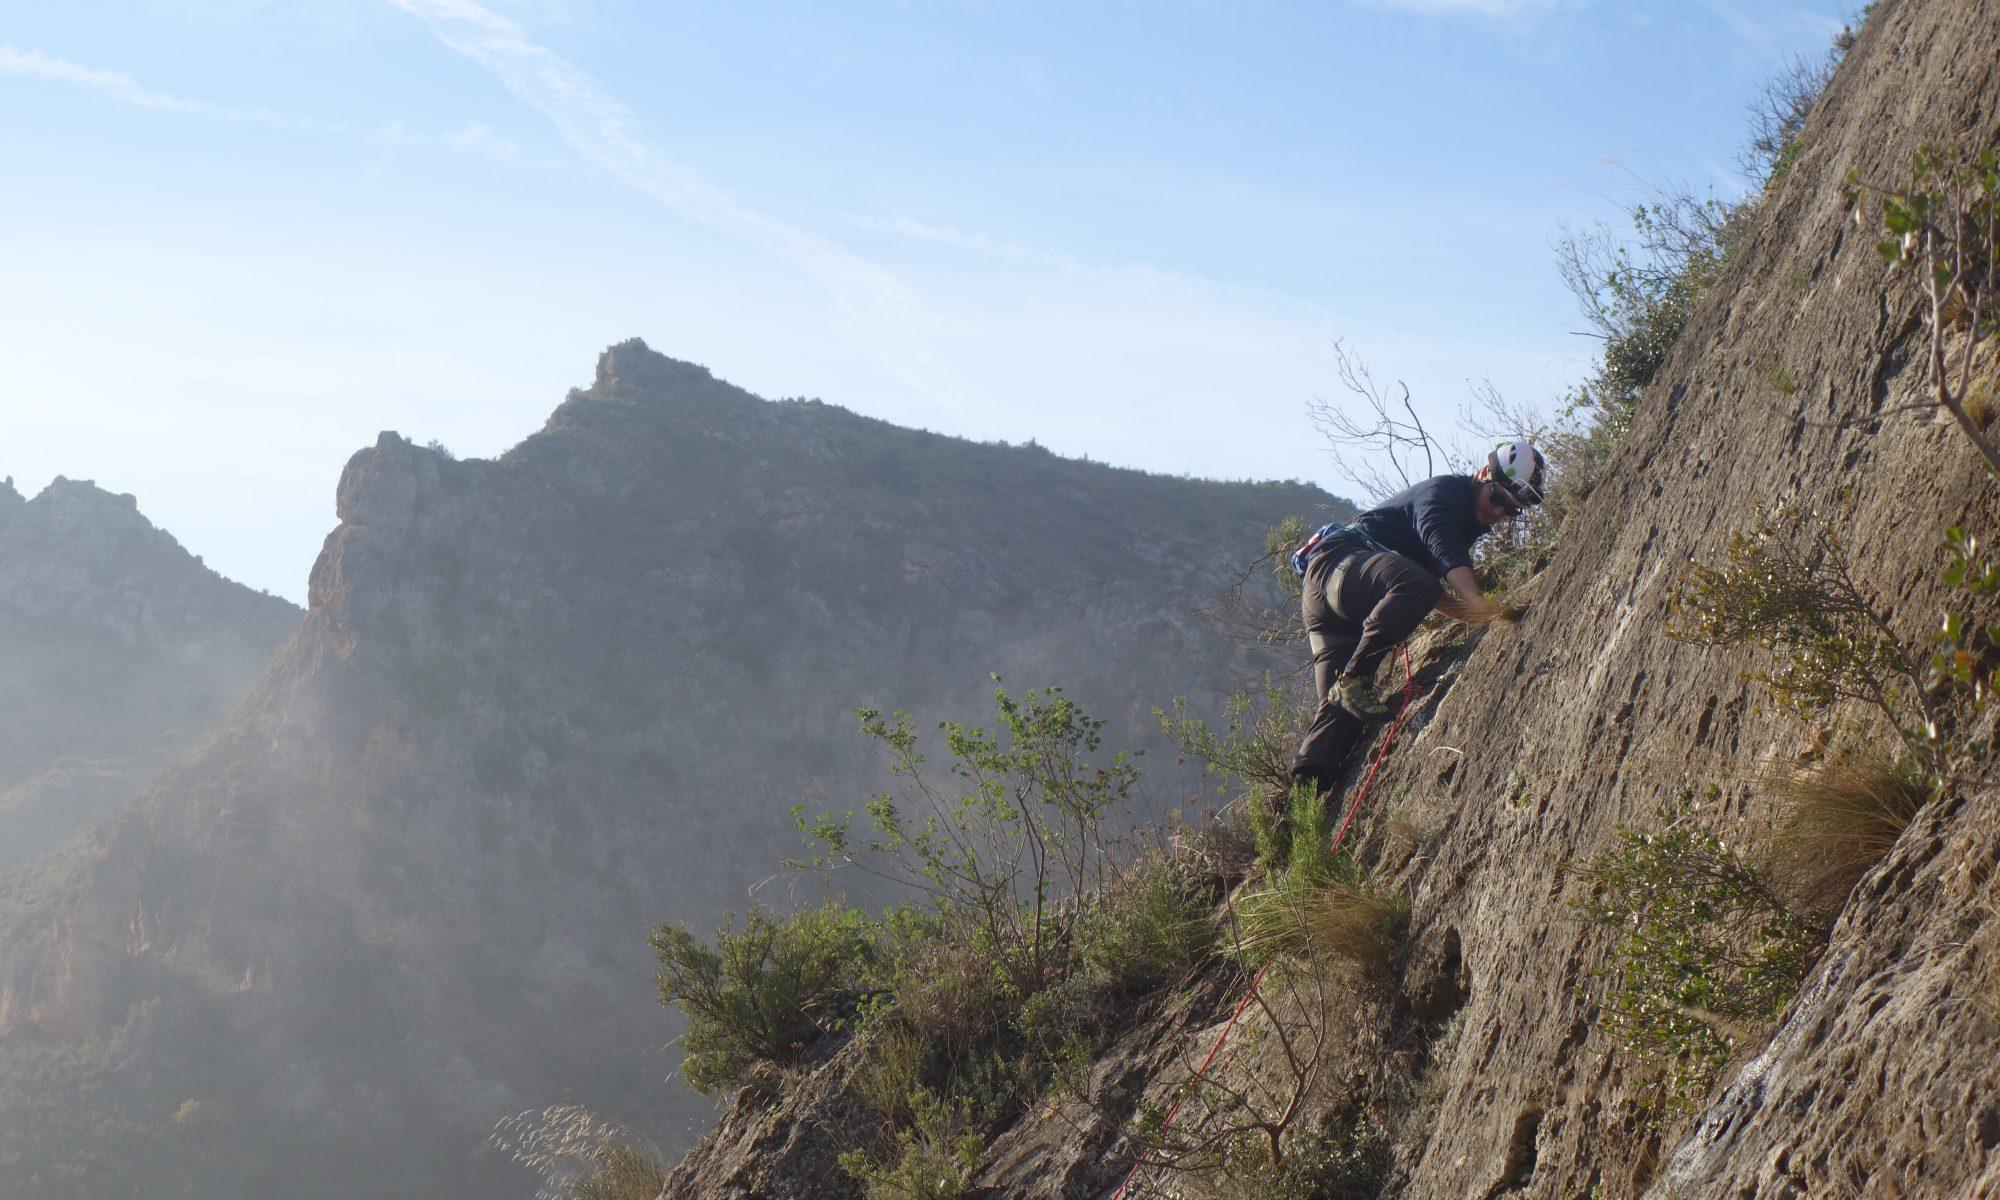 Another climber enjoying El Rincon 4a, Chodes, near Madrid.